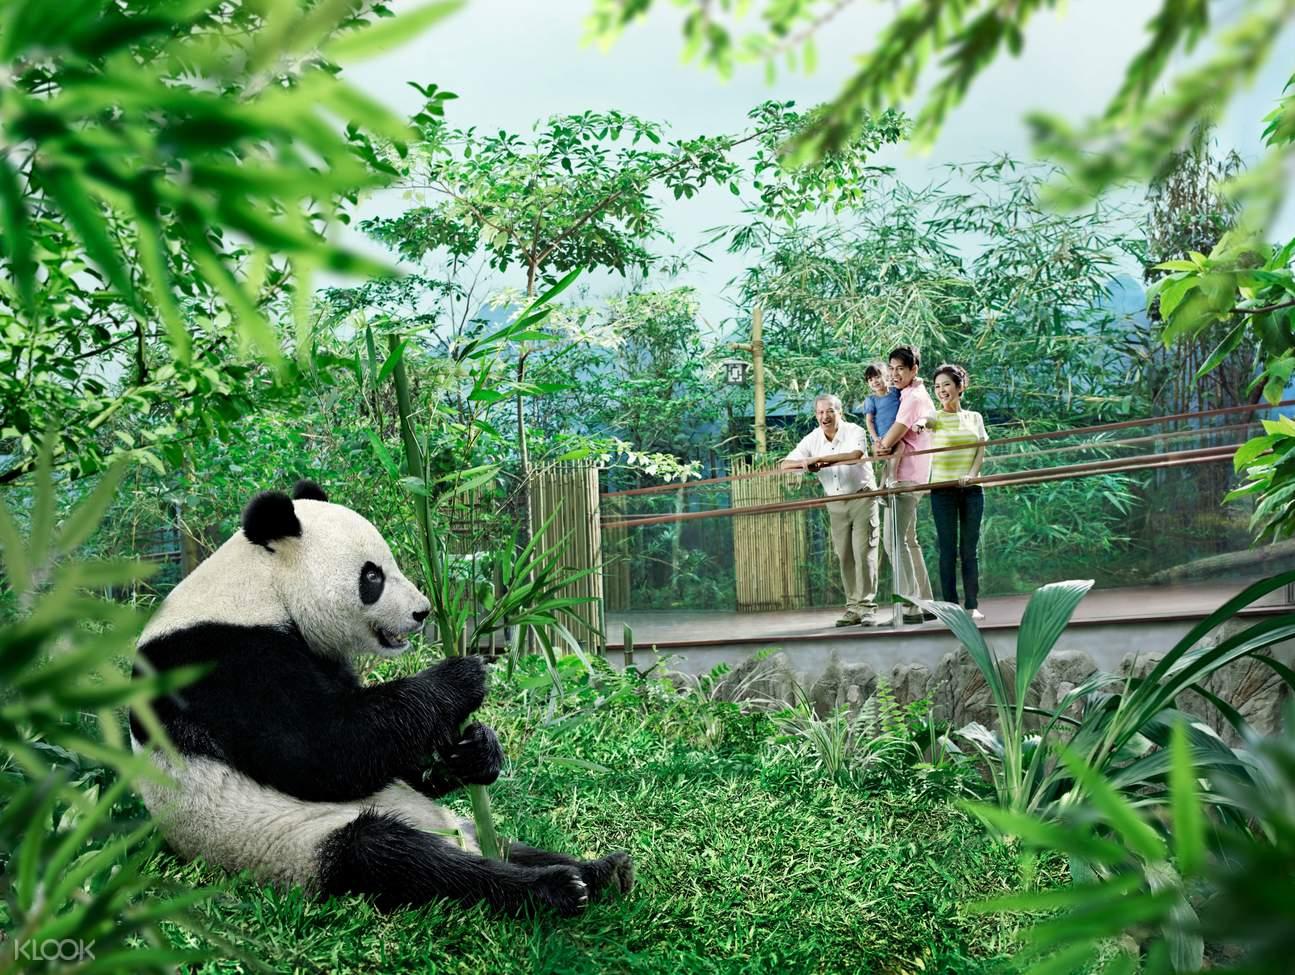 Observe the Giant Pandas